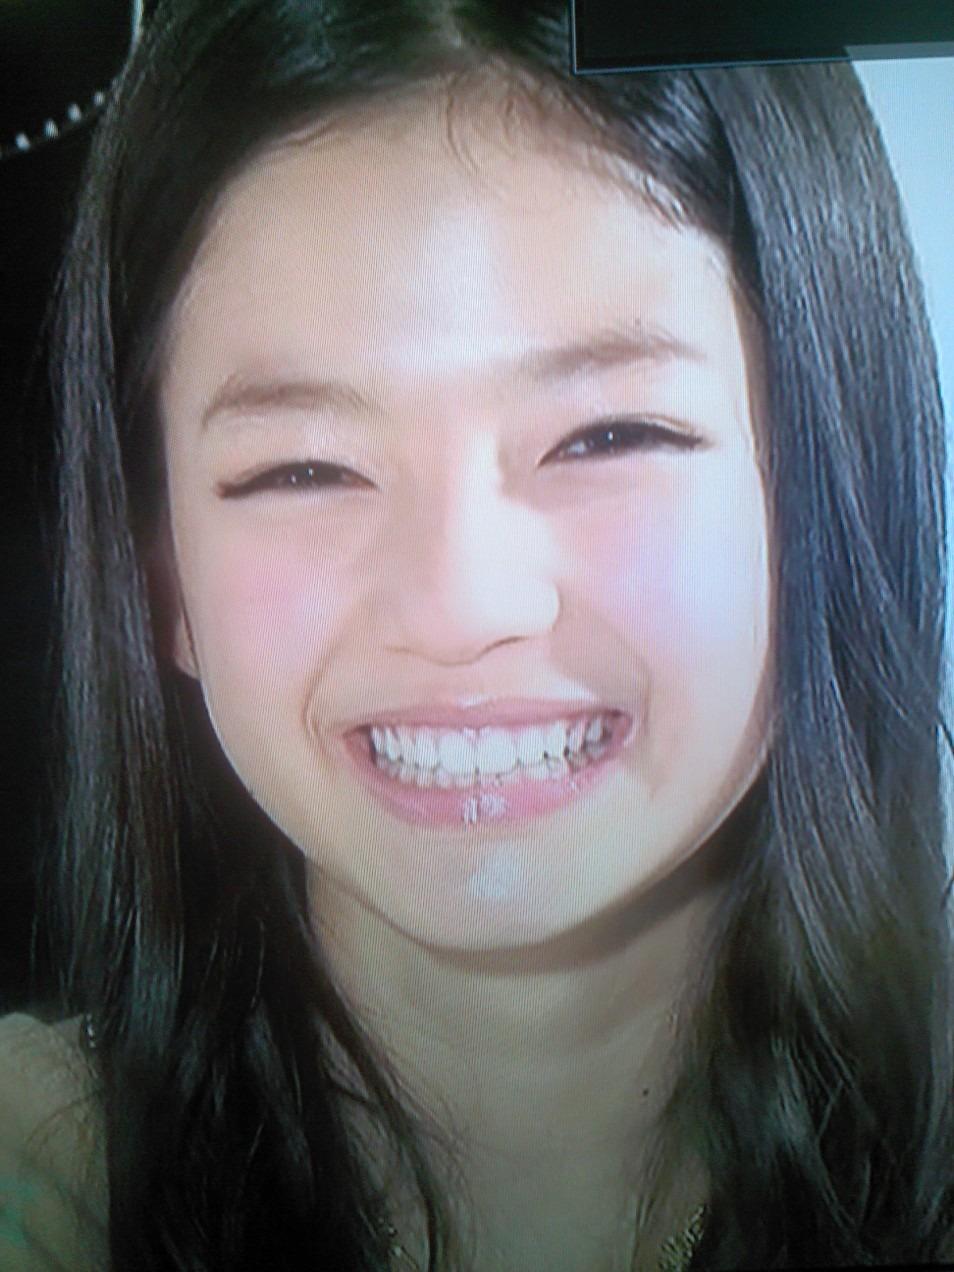 石井杏奈 (女優)の画像 p1_39